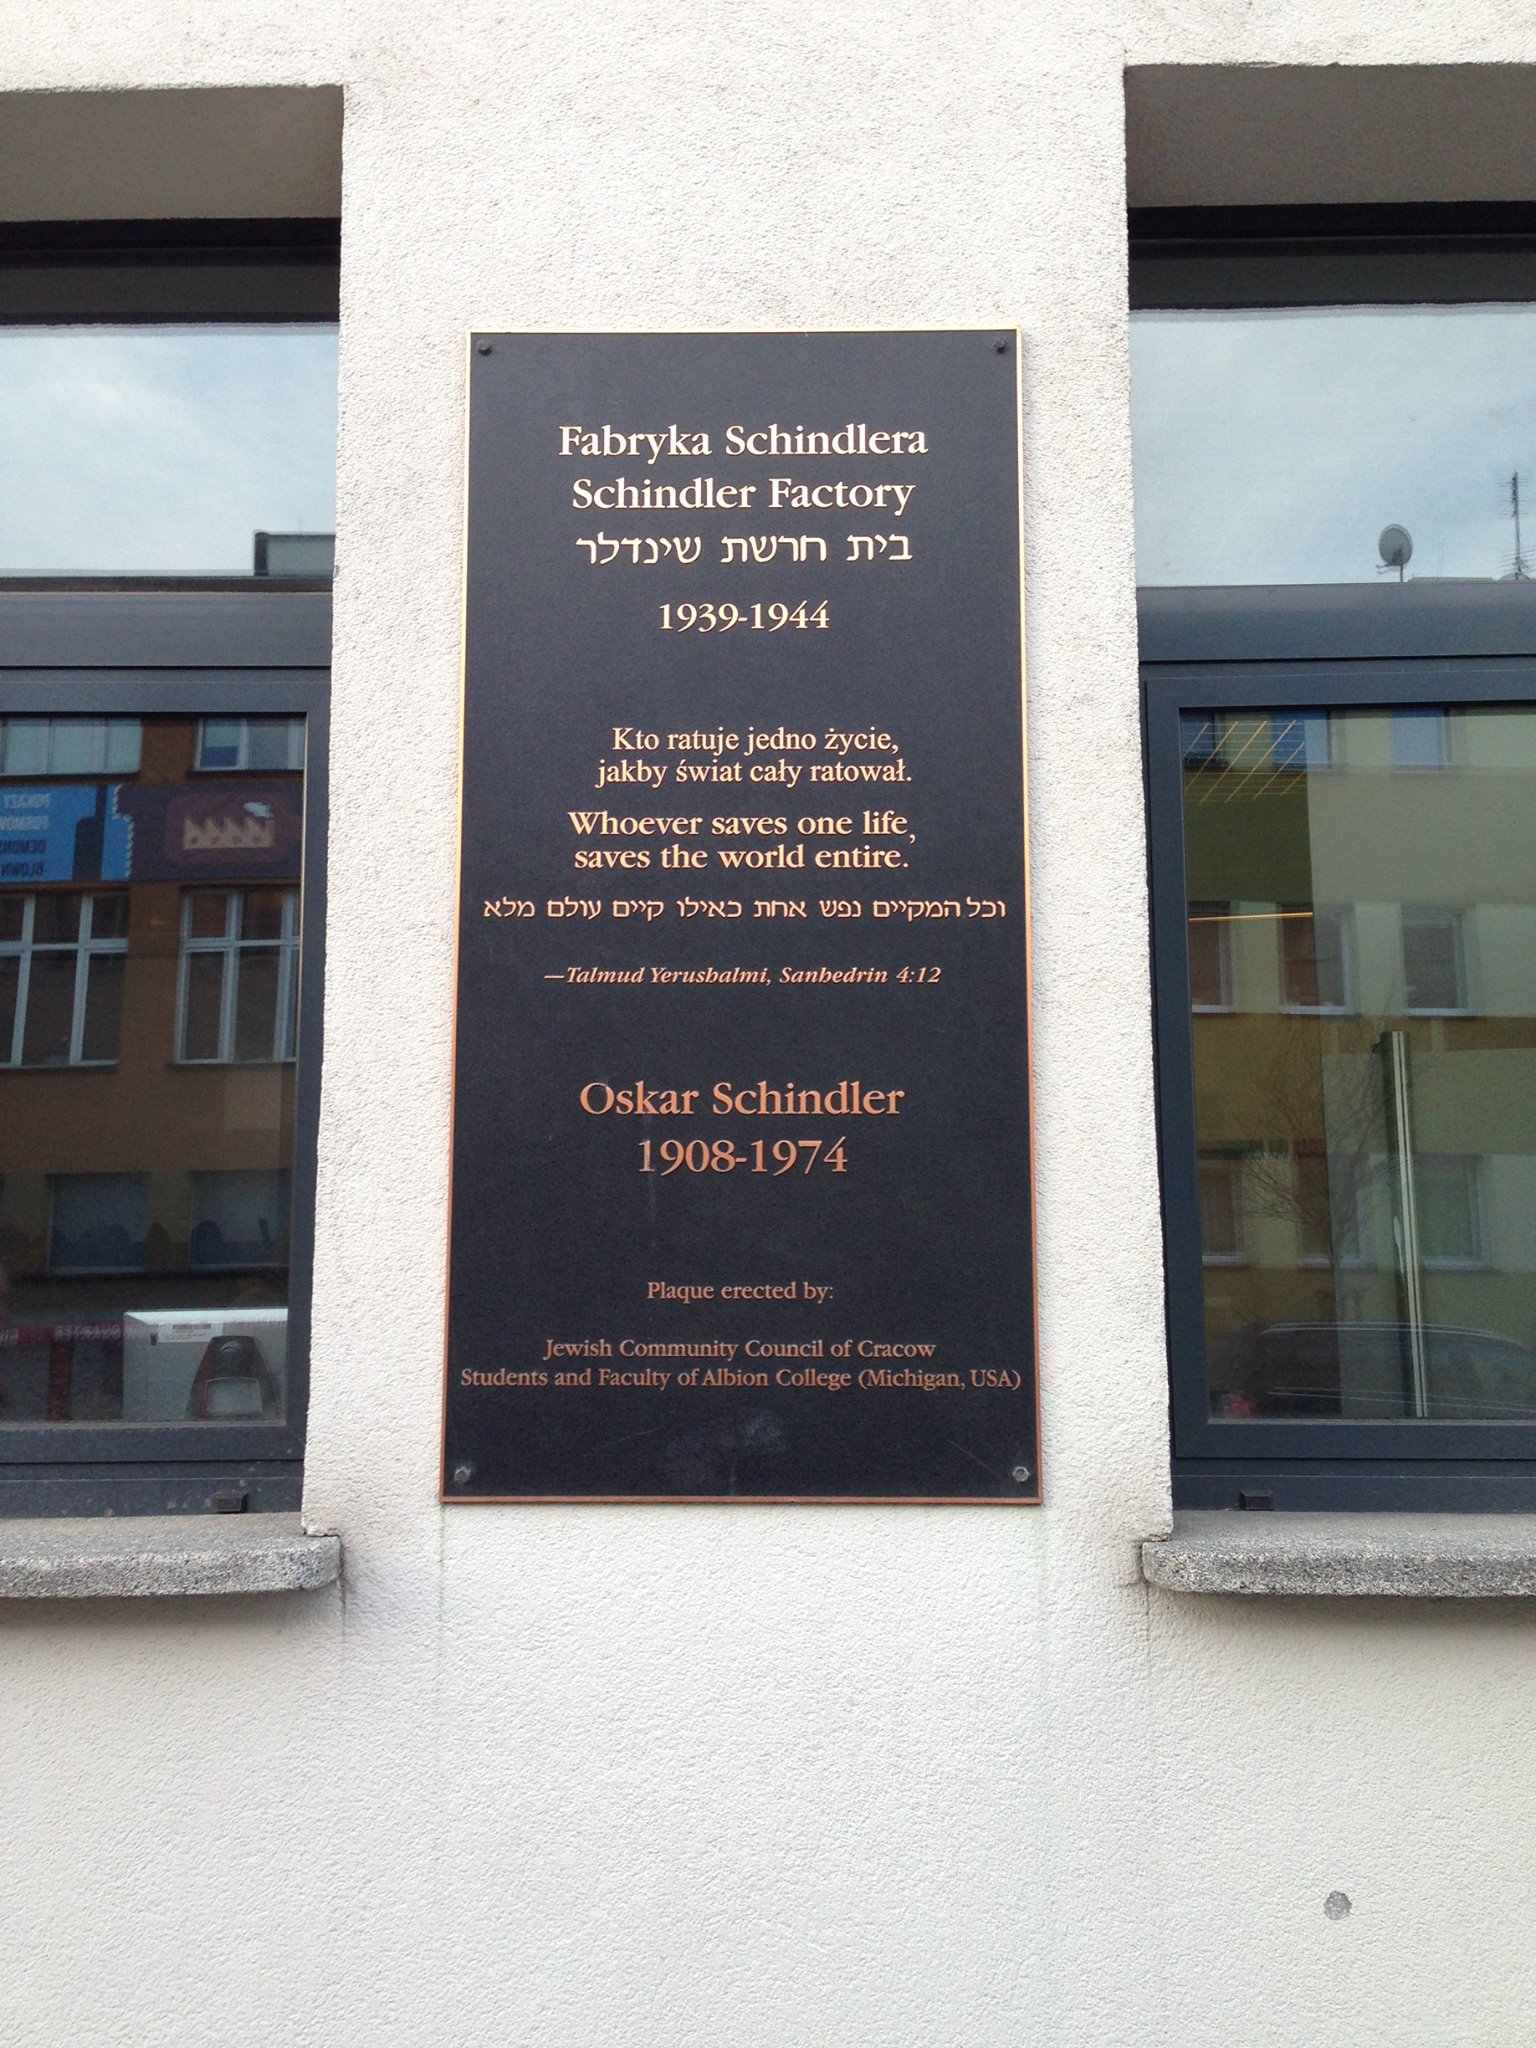 Oskar-Schindler-Plaque-Krakow-Poland